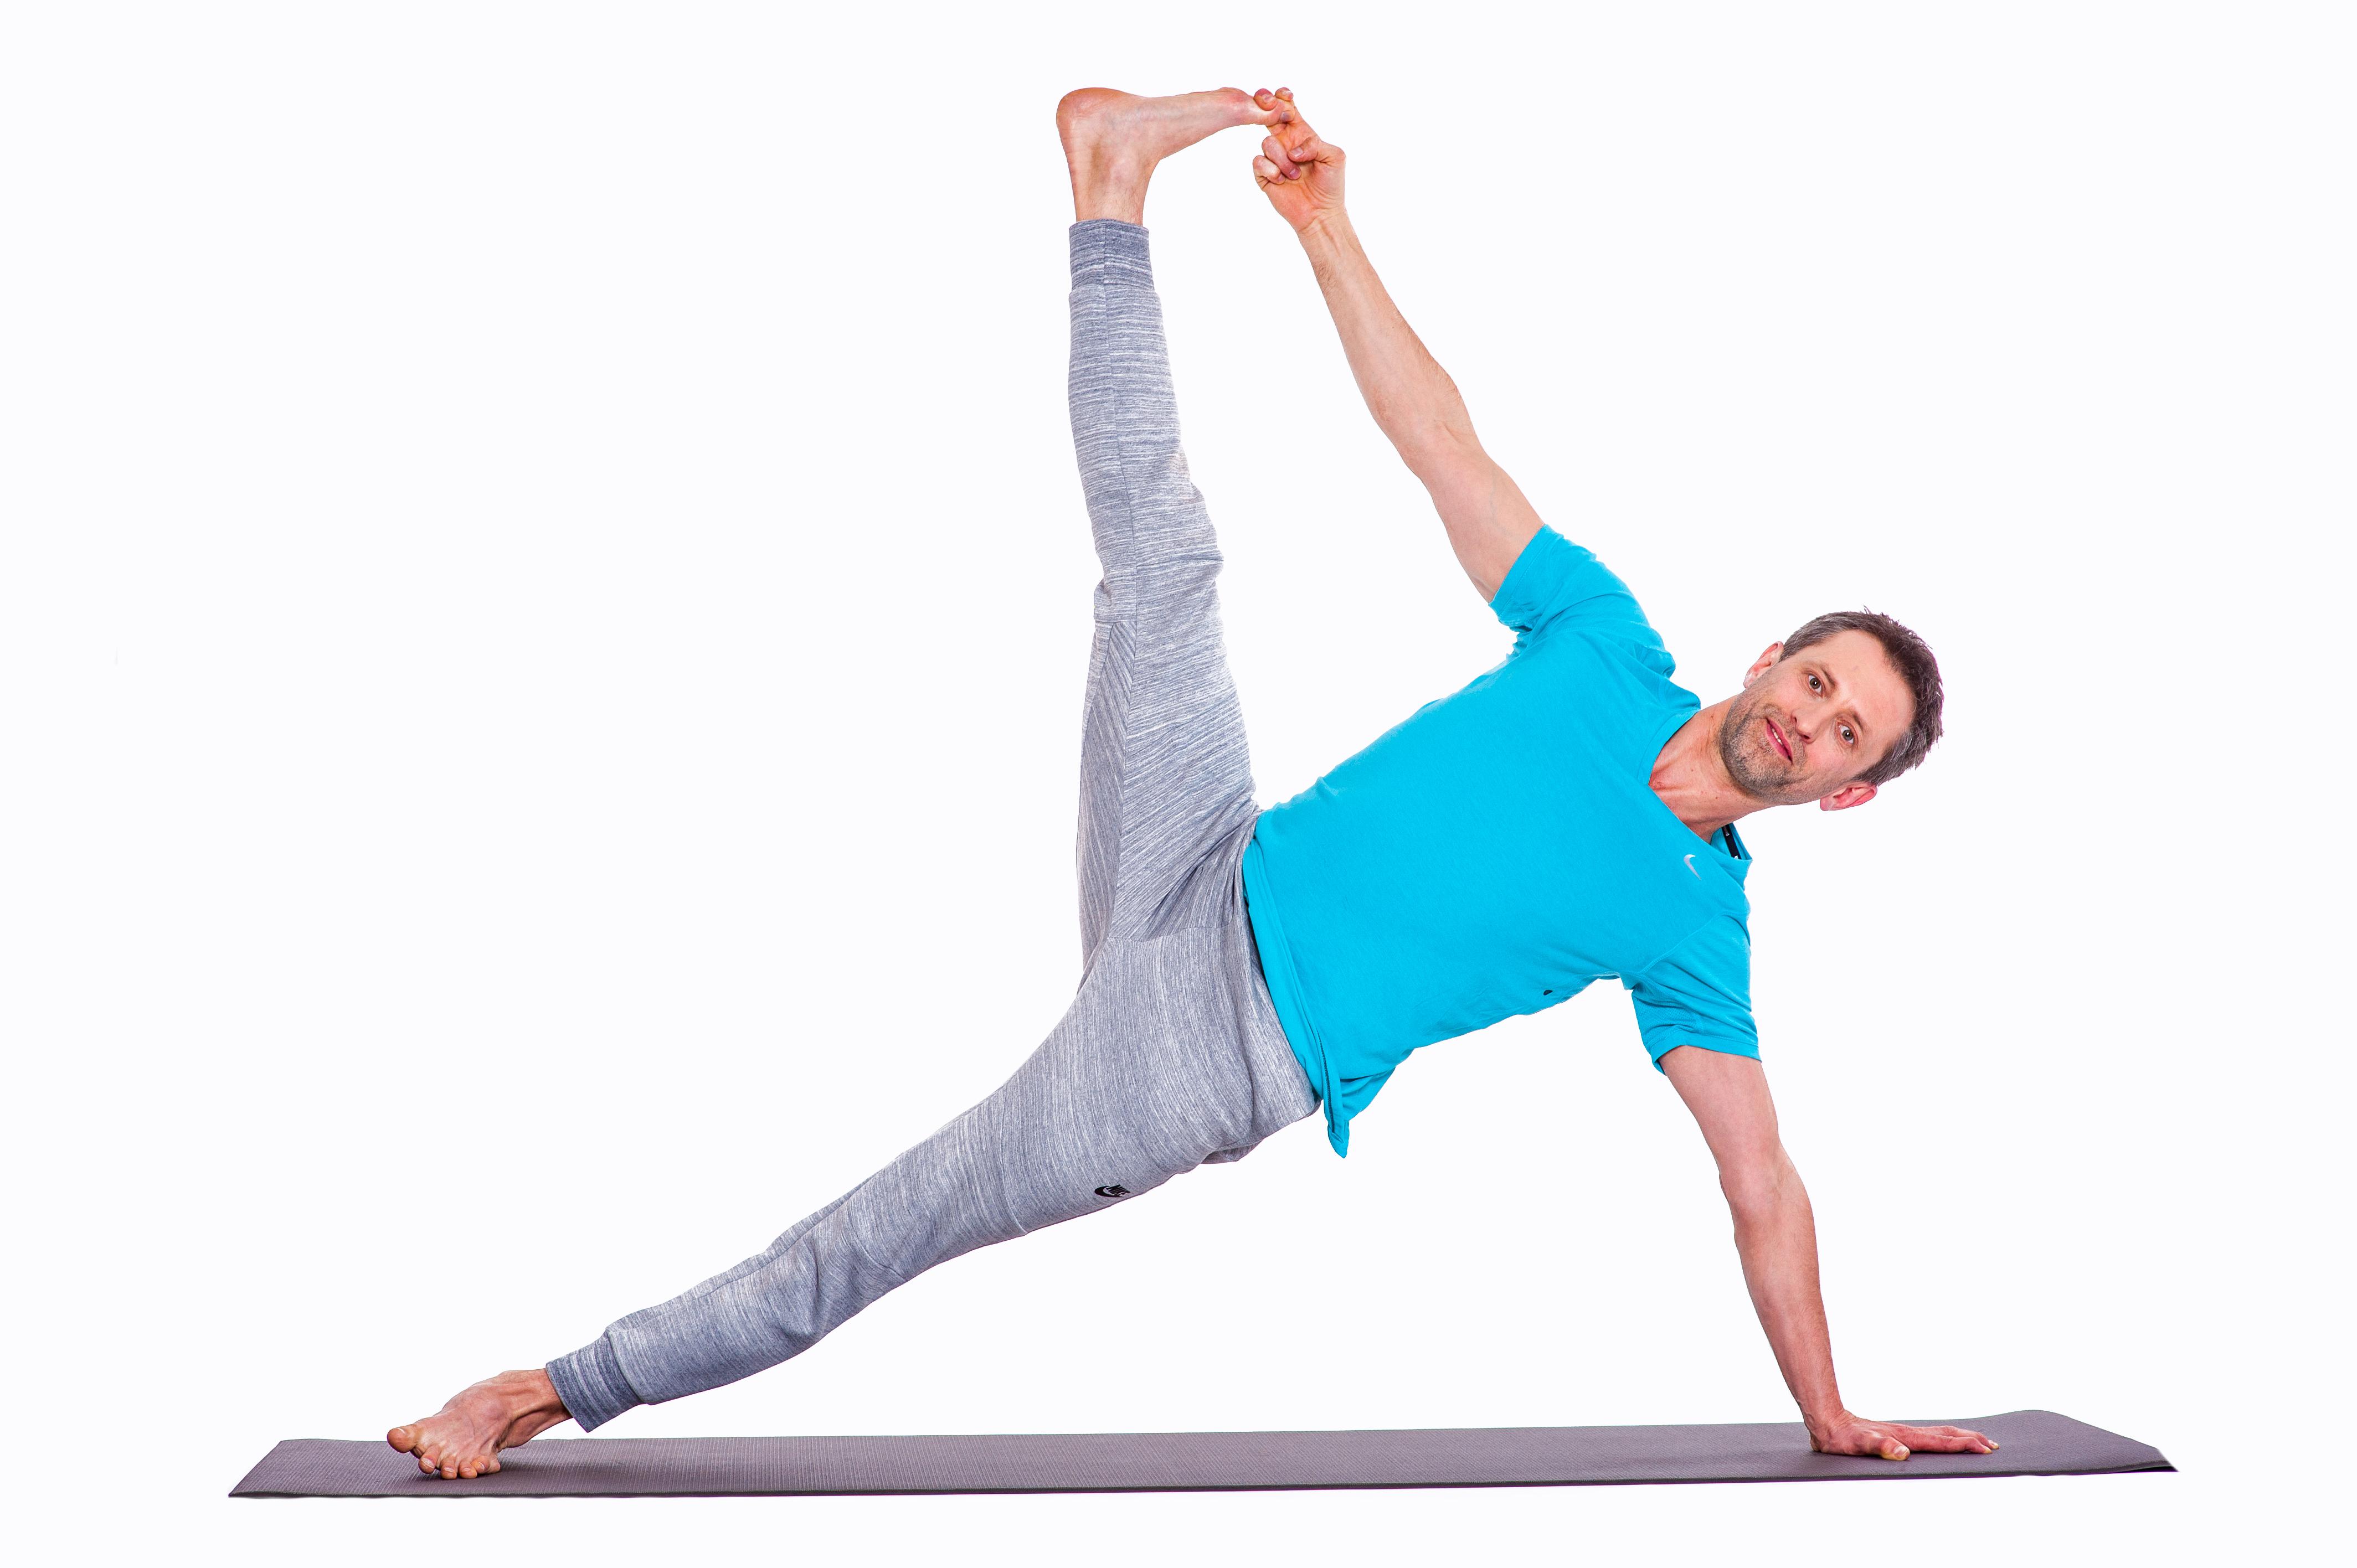 26_03_2014_Yoga 0122